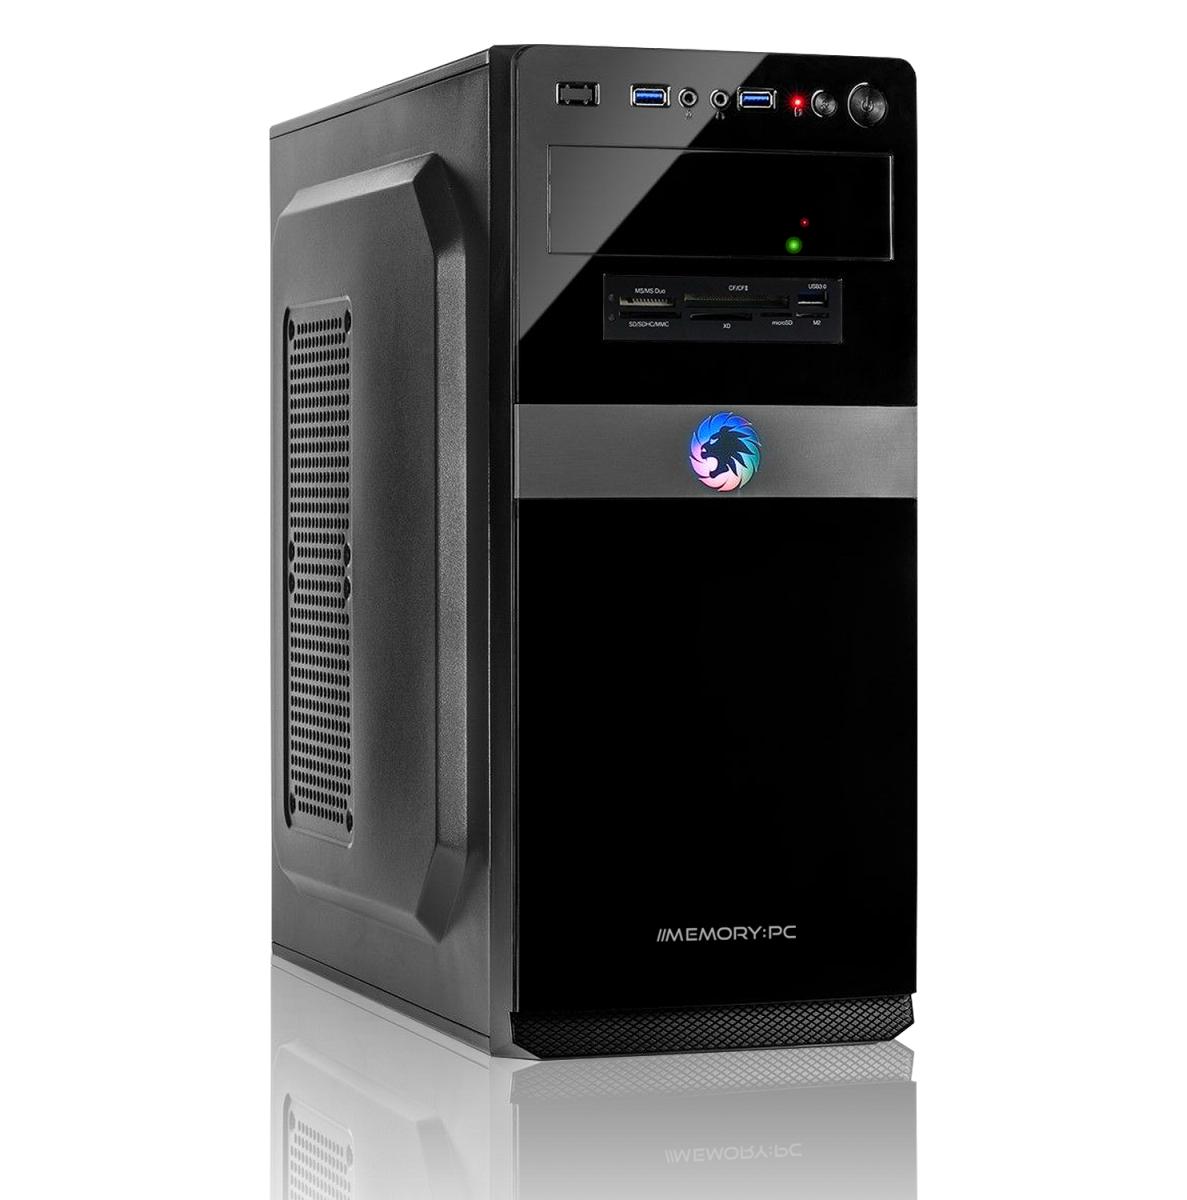 GAMING PC AMD AMD X4 950 4x 3.8 GHz | 8GB DDR4 | GTX 1650 4GB | 240GB SSD HDD